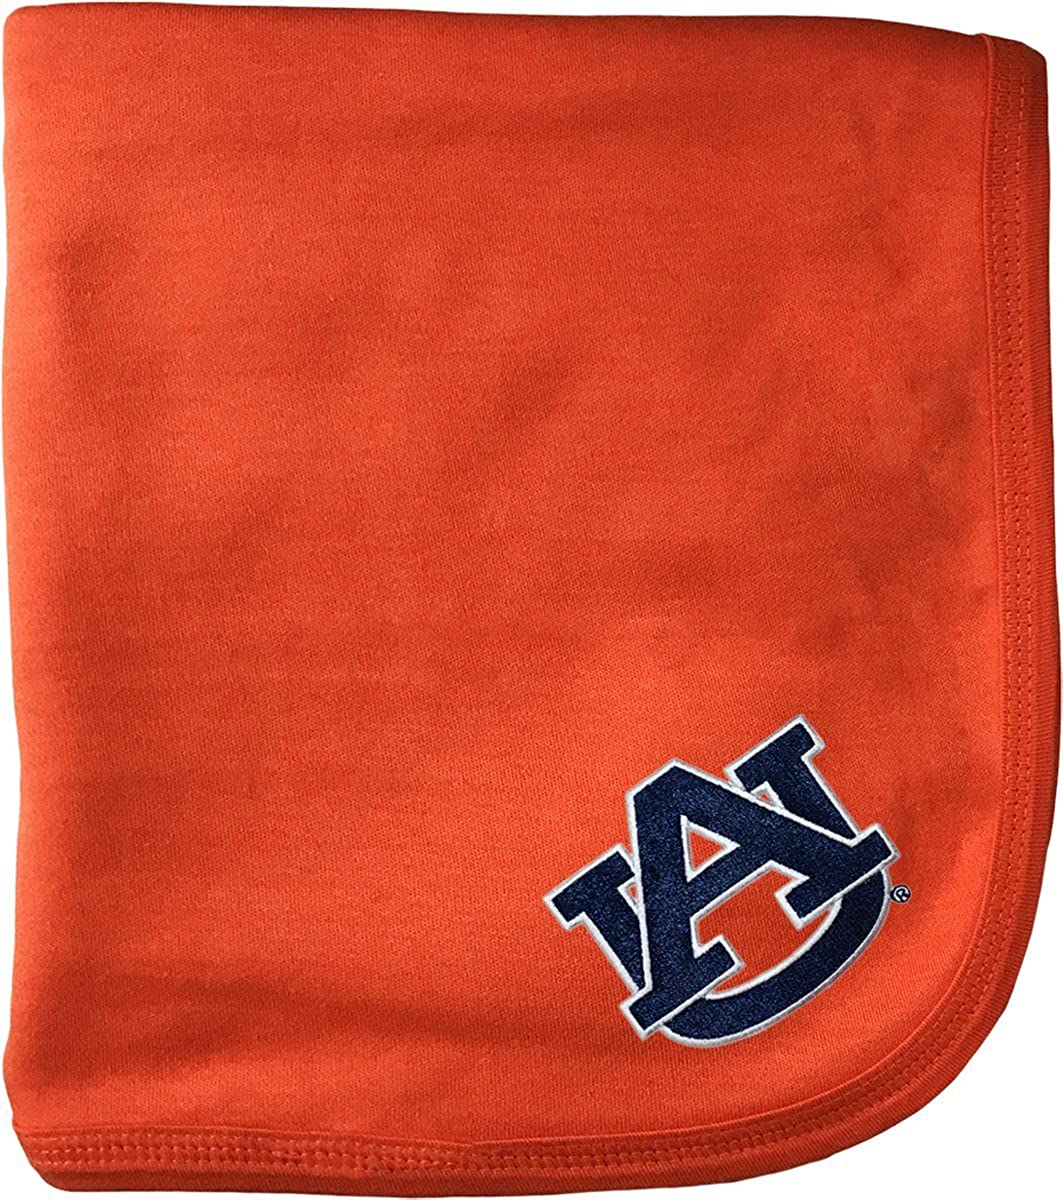 Auburn University Tigers NCAA Baby Blanket 33